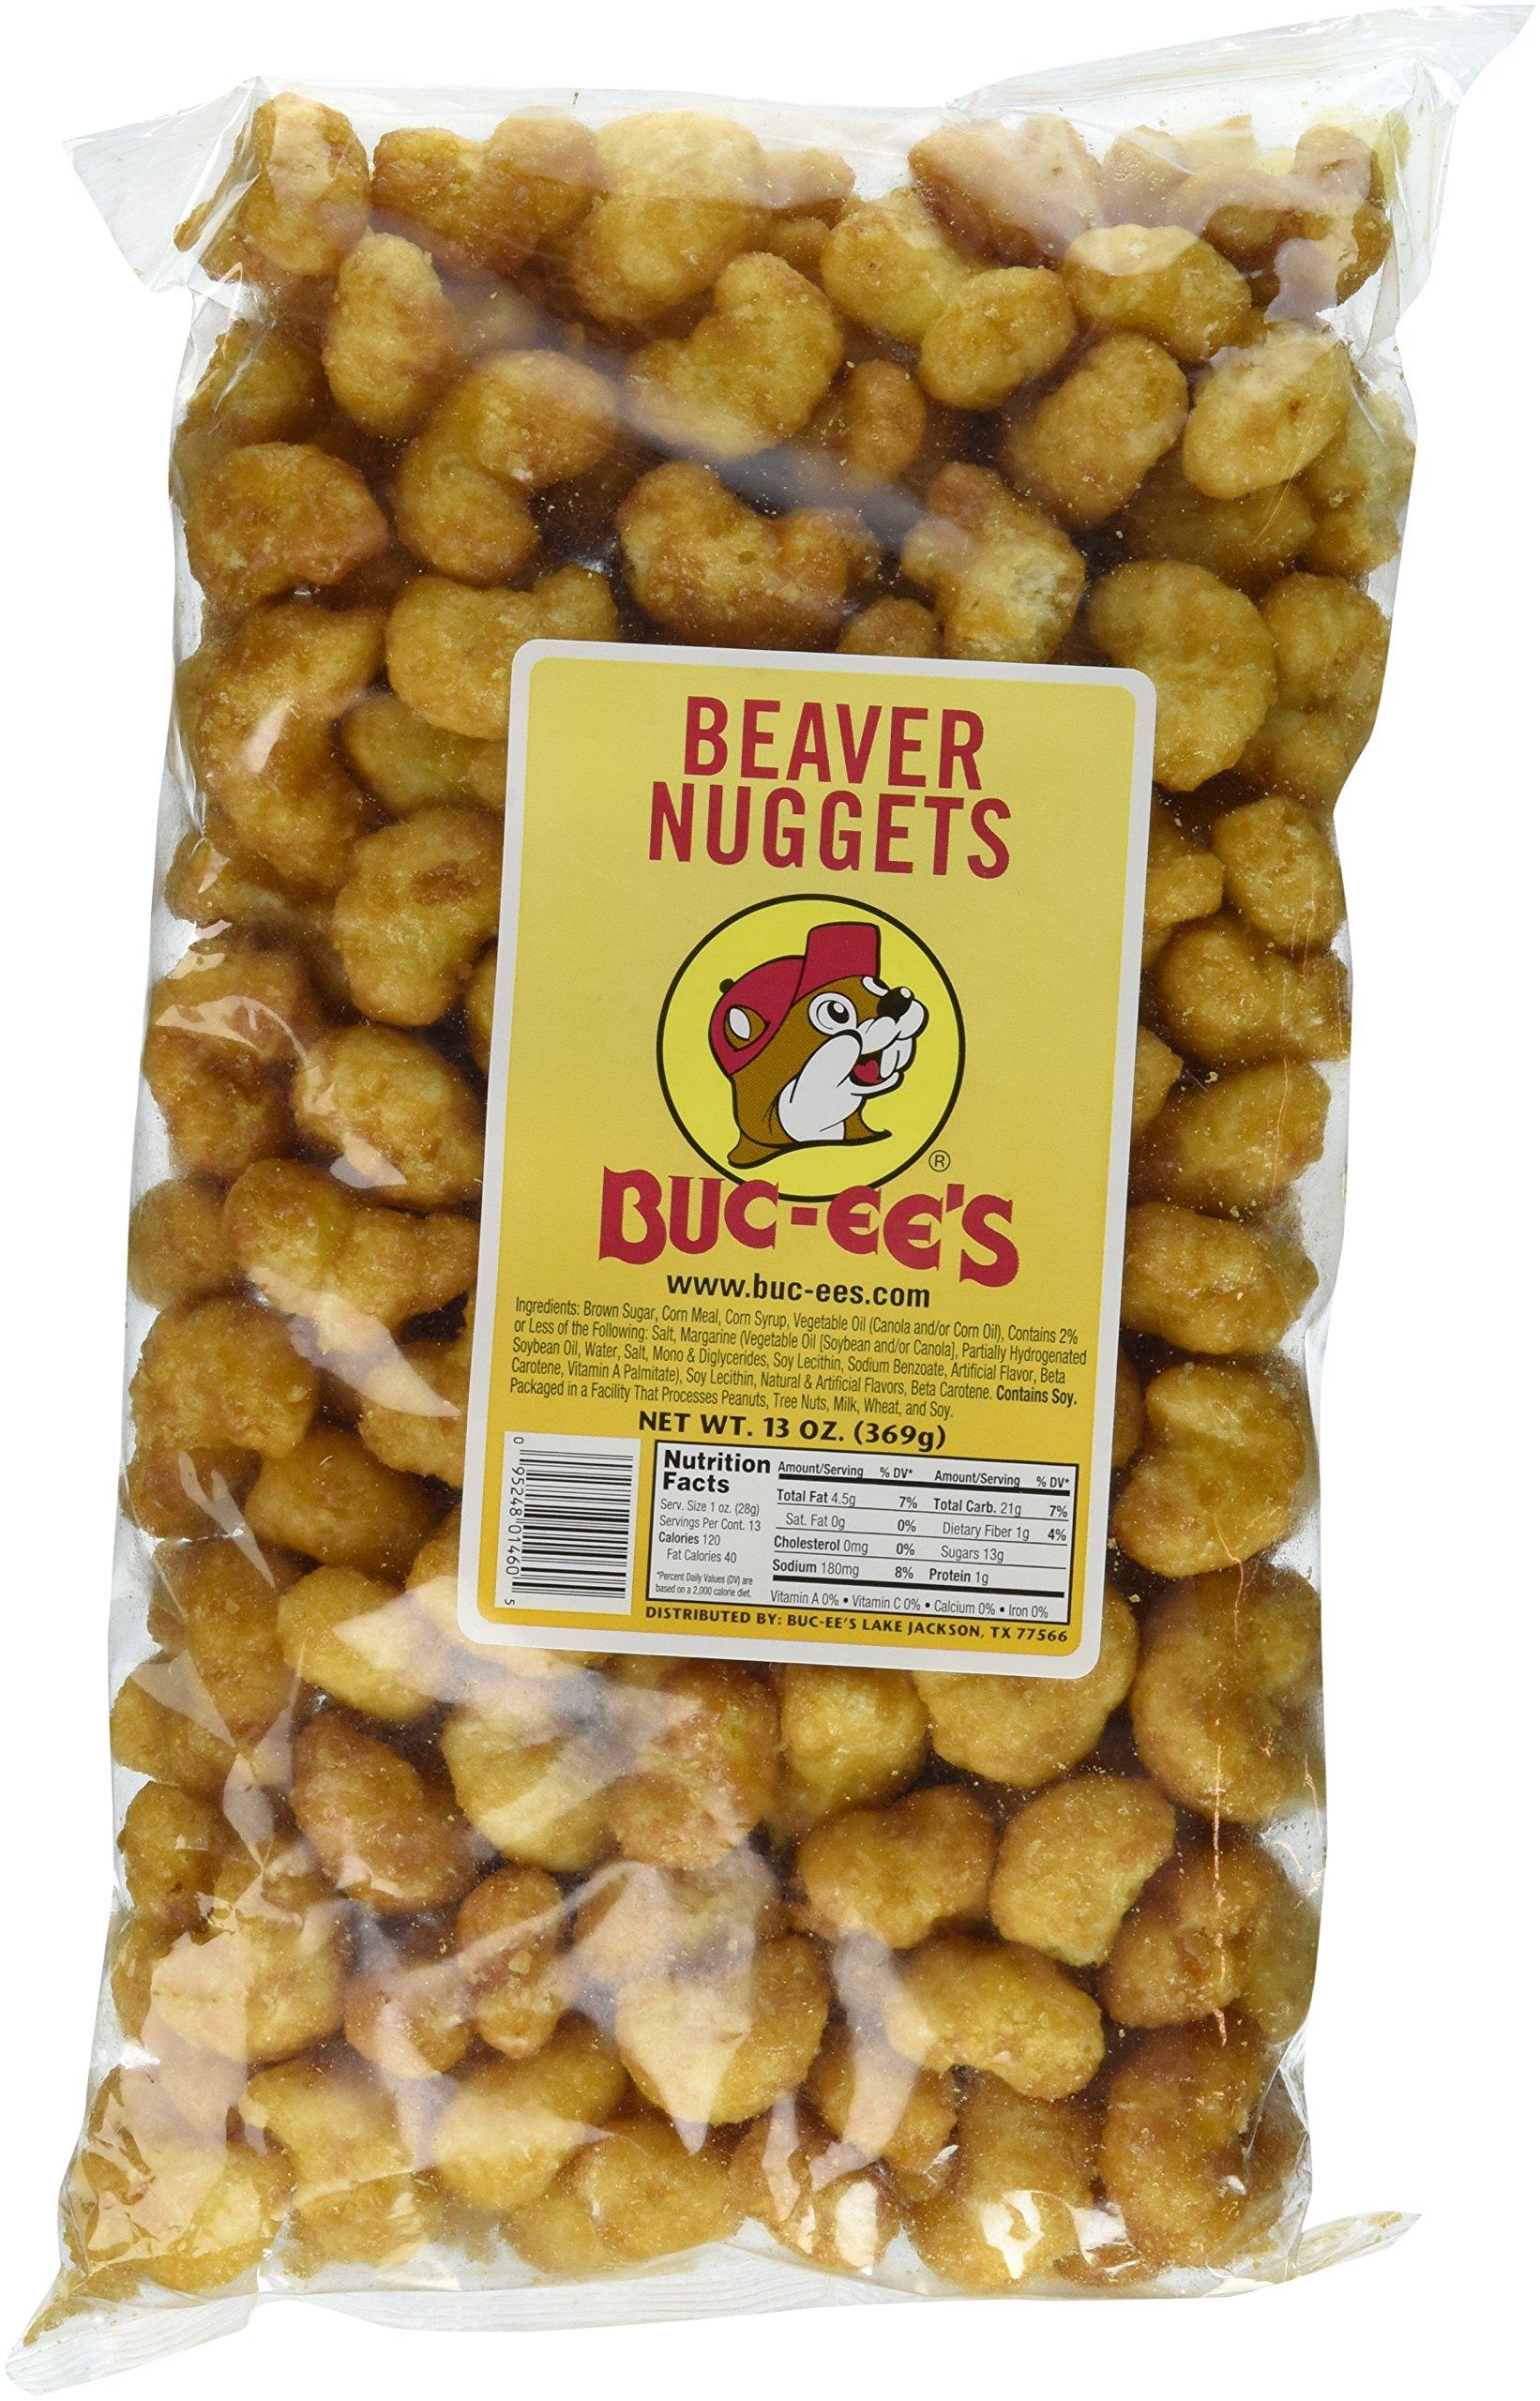 Buc-ees Beaver Nuggets Sweet Corn Puff Snacks Texas Bucees (Pack of 2 Bags)